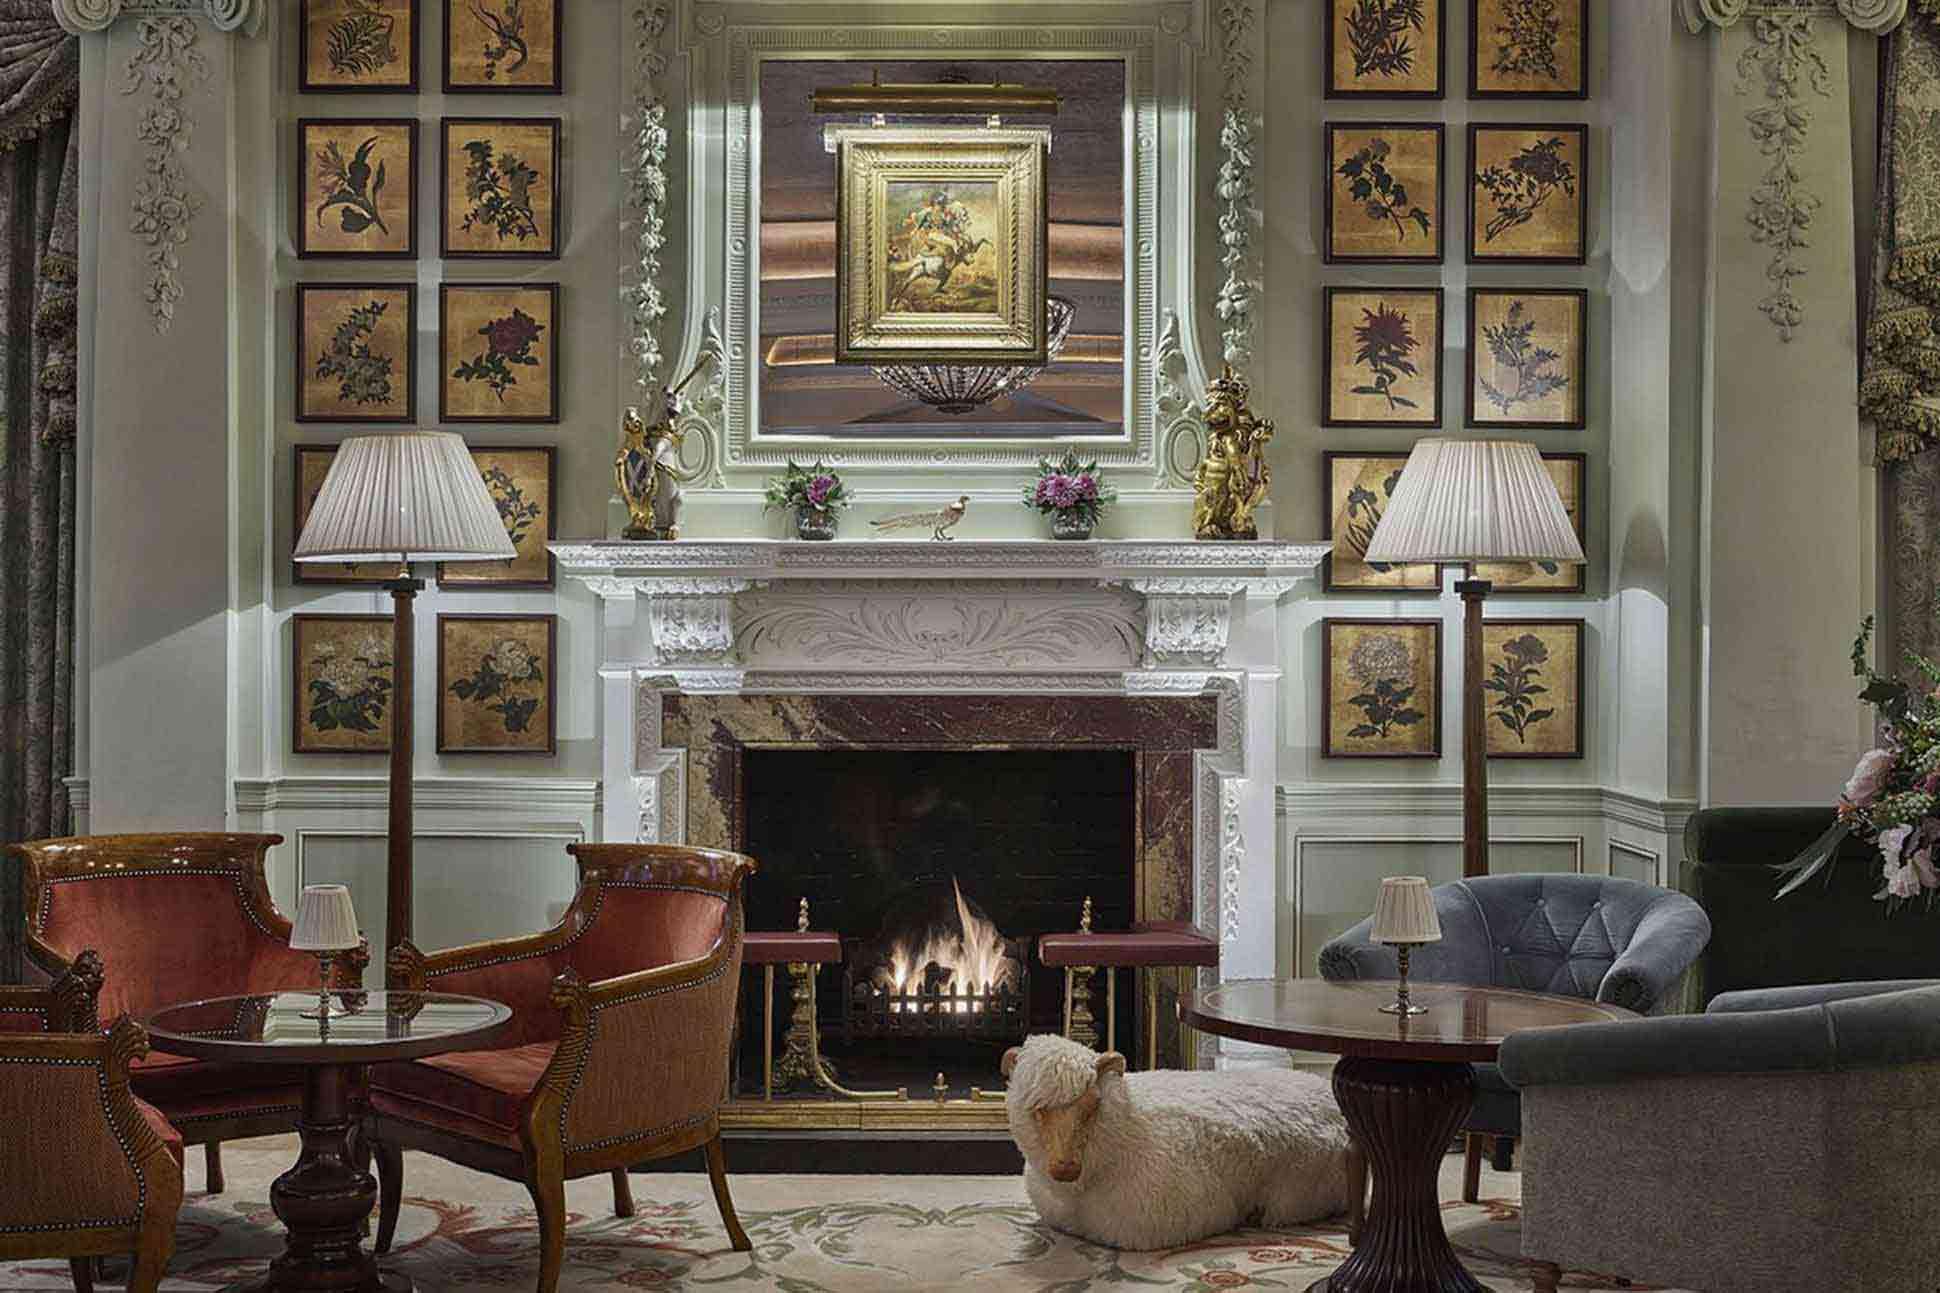 The Goring Hotel, London, United Kingdom